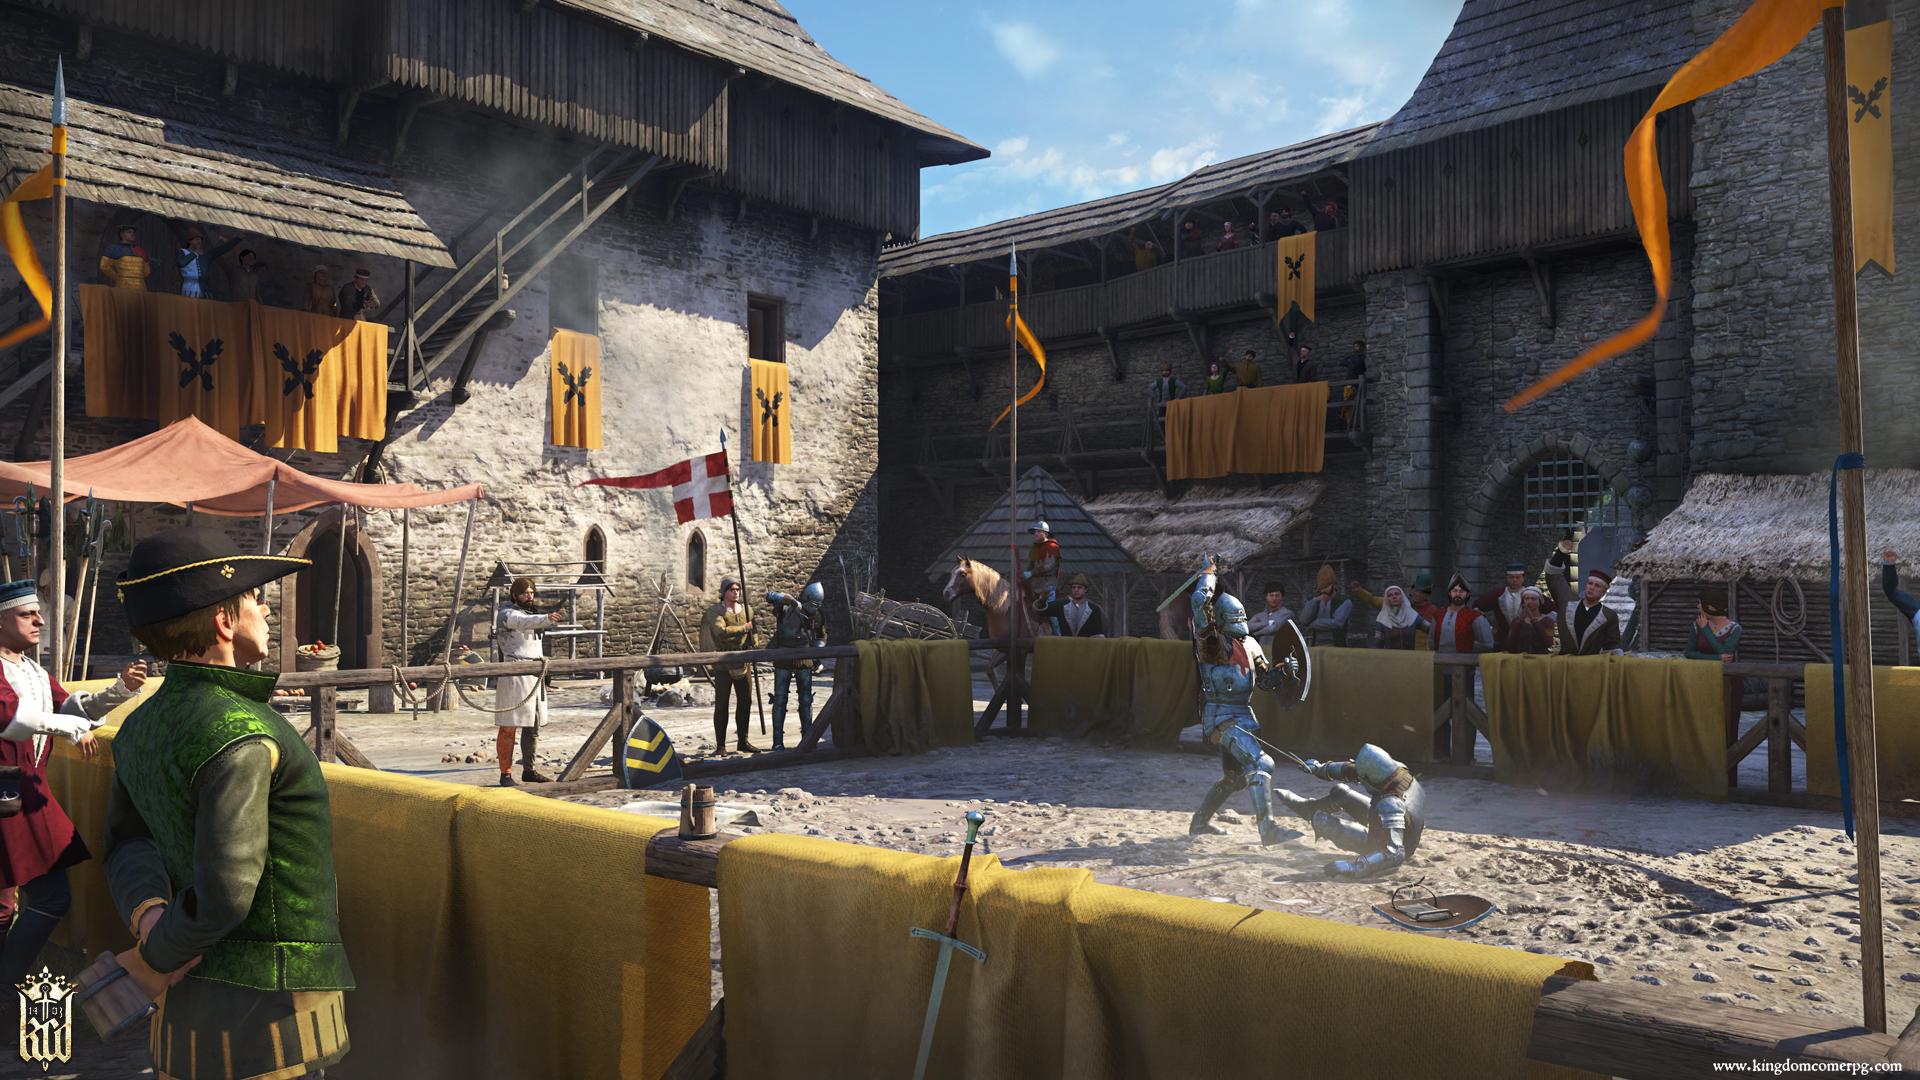 General 1920x1080 Kingdom Come: Deliverance artwork knight warrior city medieval castle